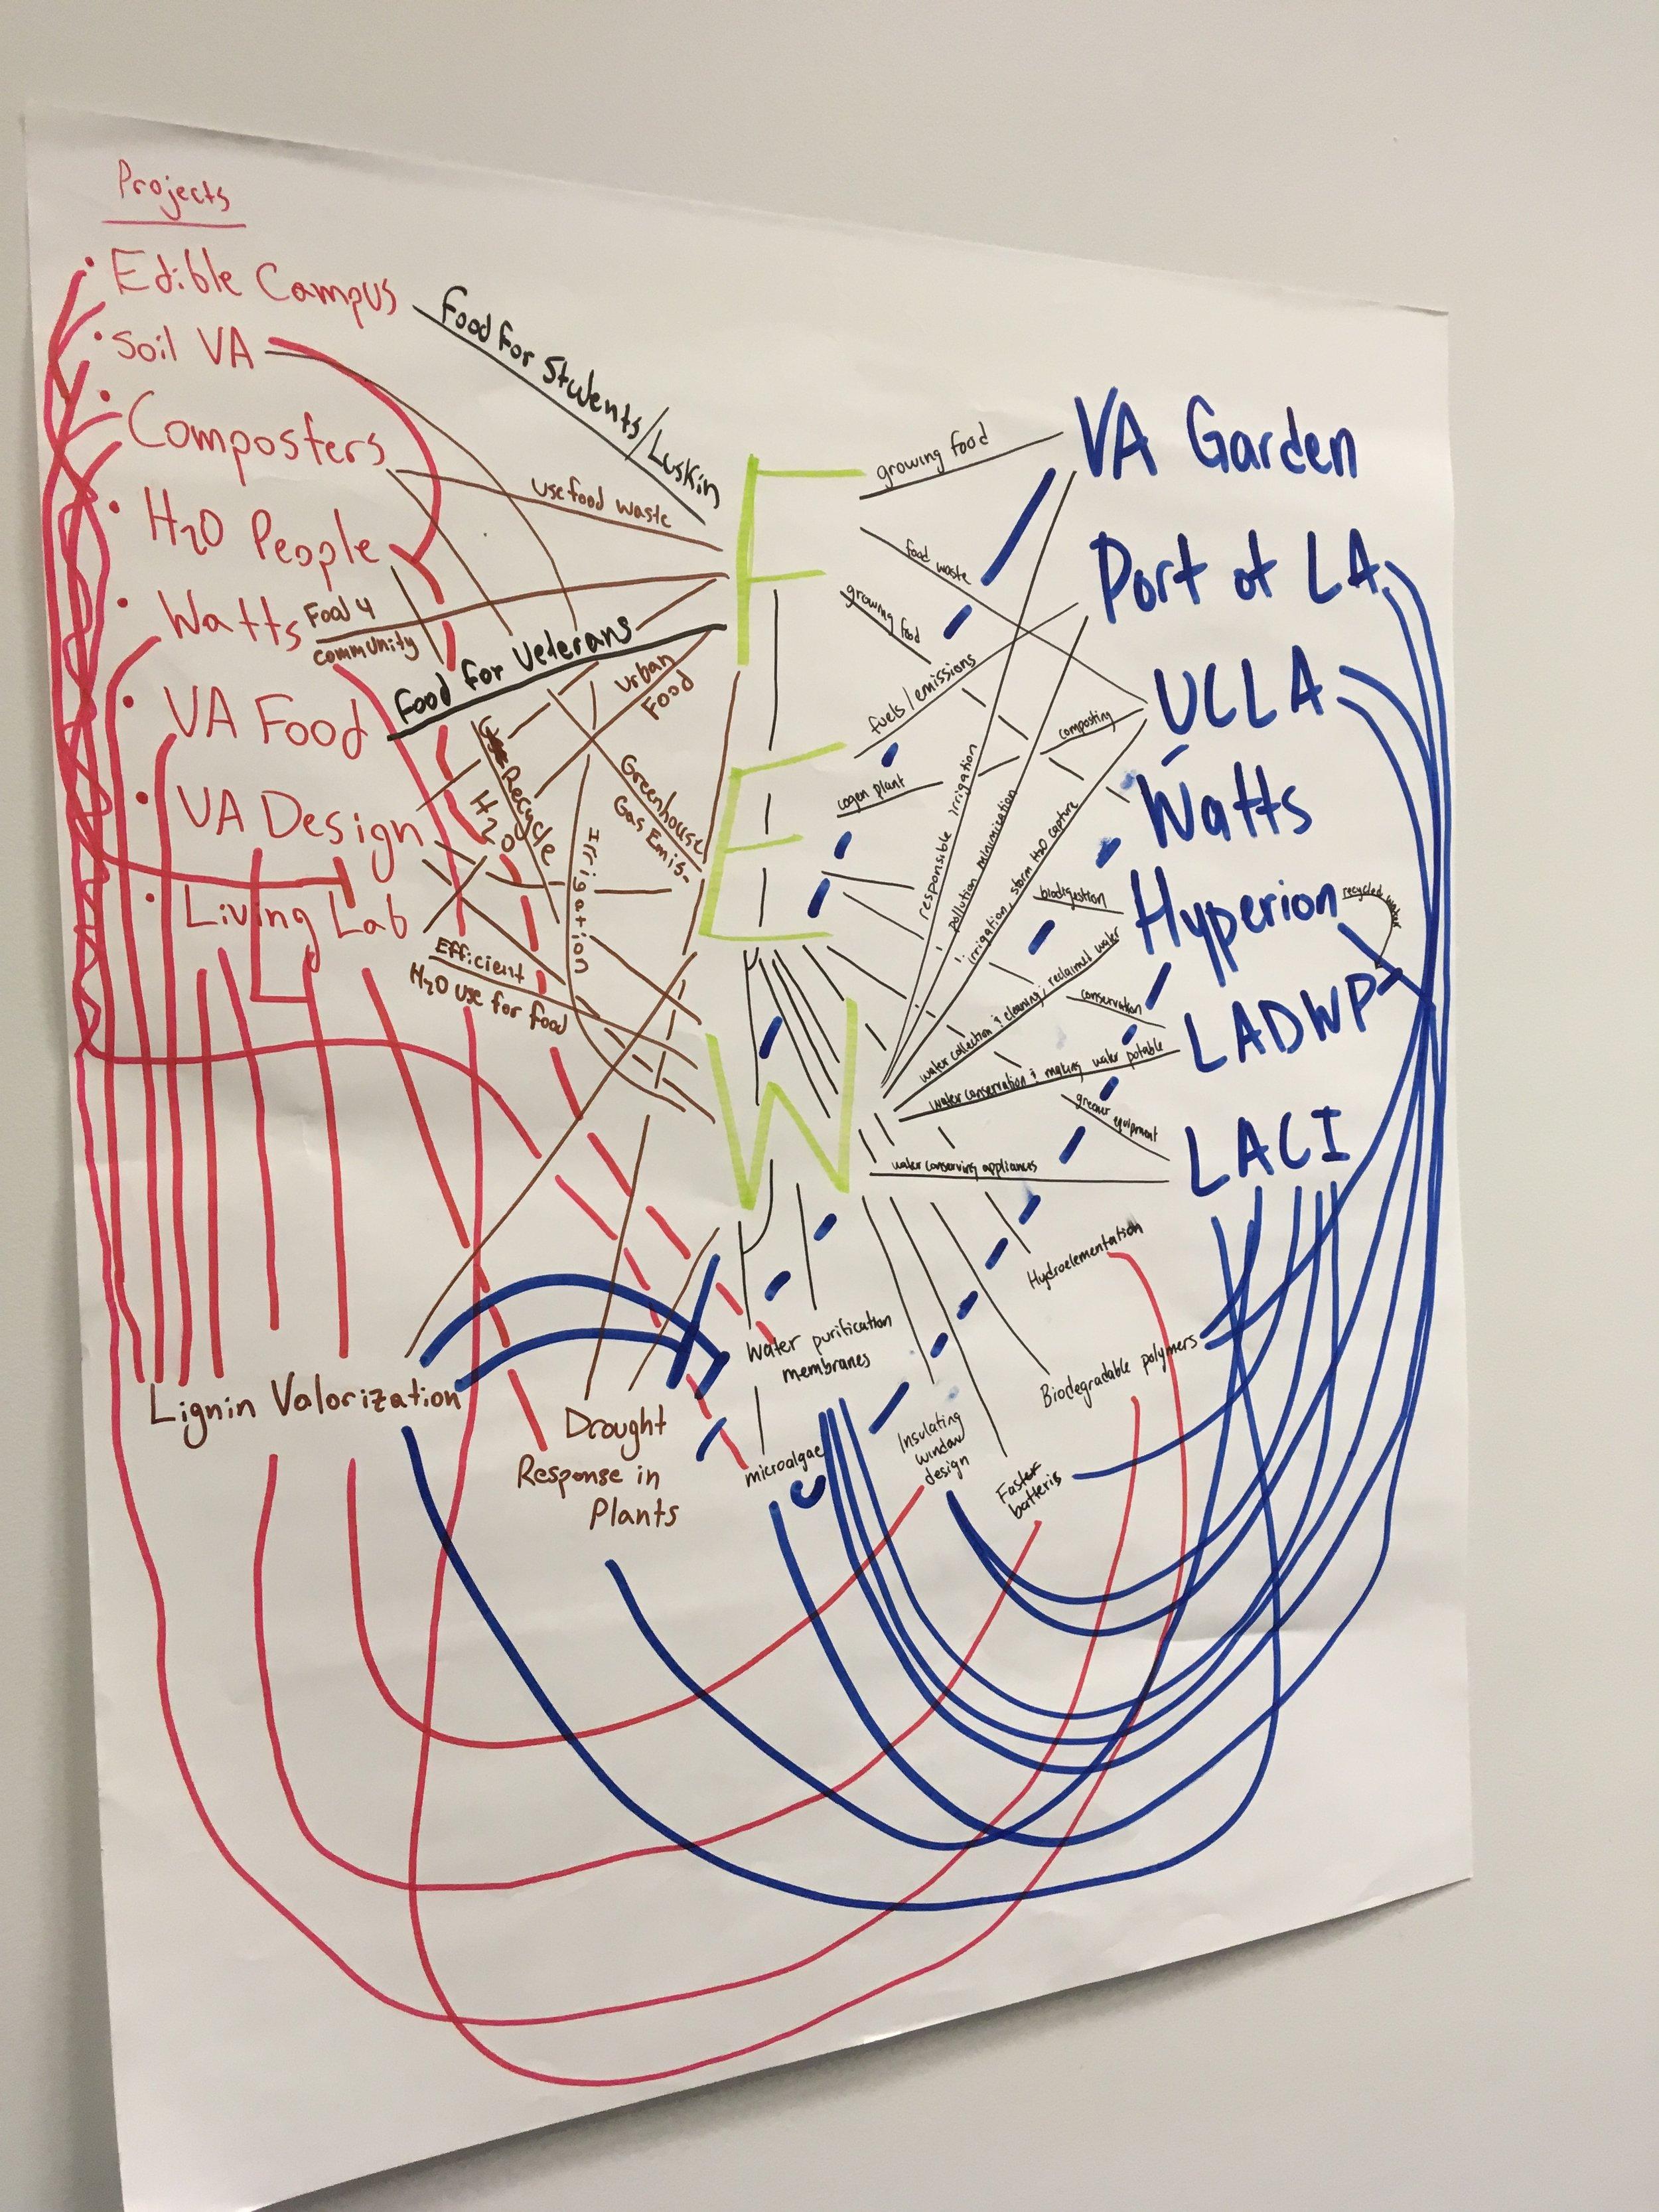 December 7, 2018: FEWS Field Lab Concept Map